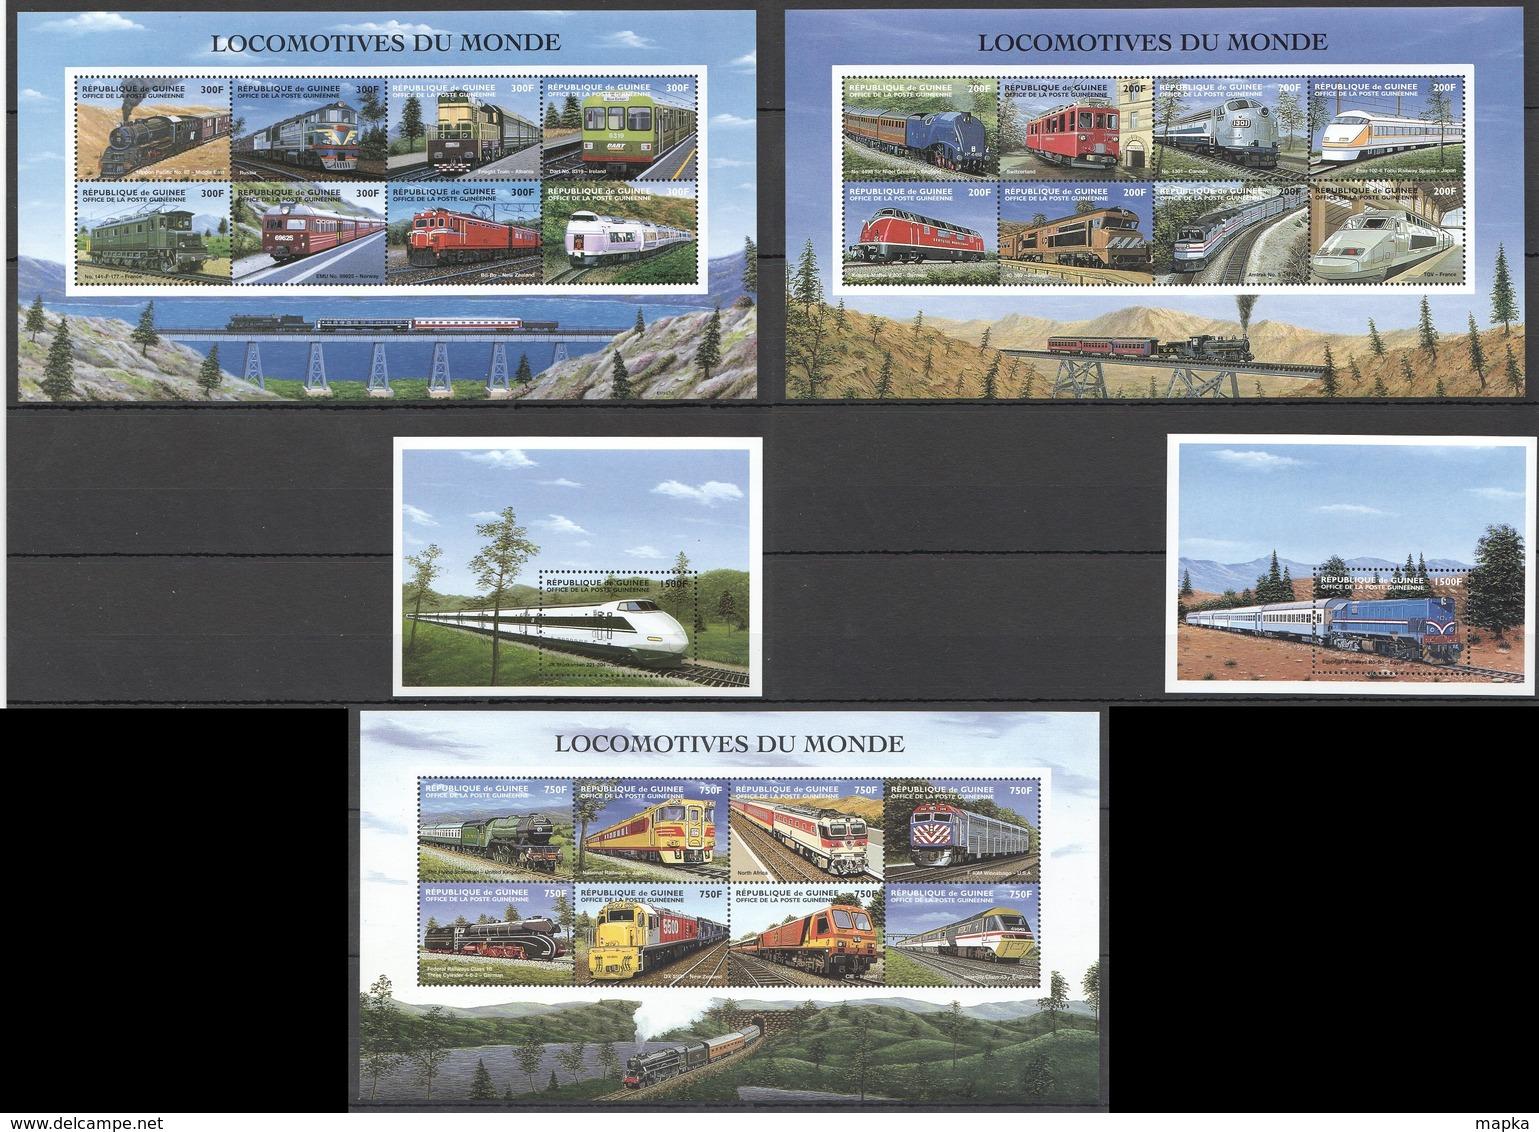 V357 DE GUINEE TRANSPORTATION TRAINS LOCOMOTIVES DU MONDE 3KB+2BL MNH - Eisenbahnen